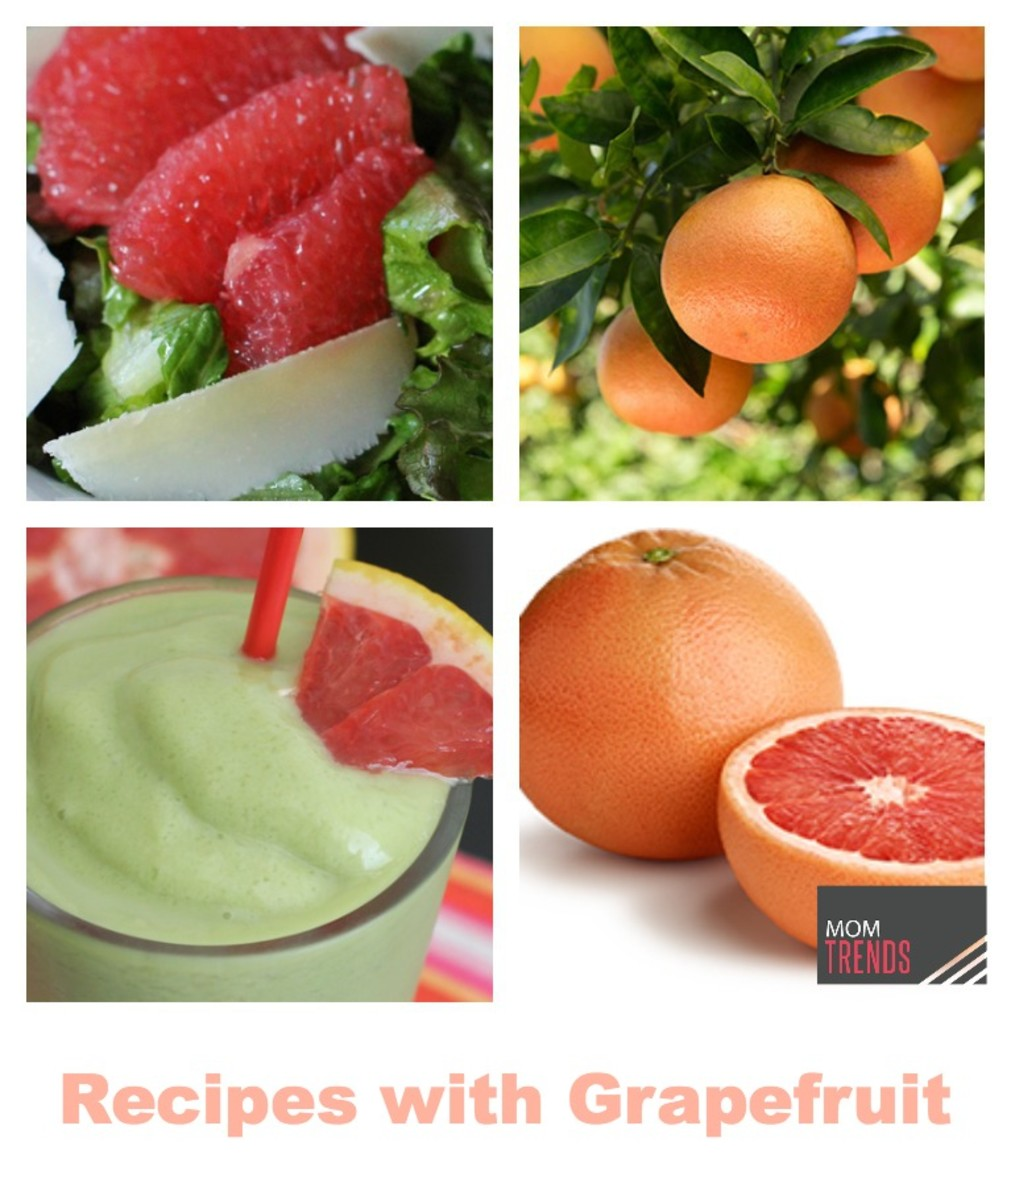 Recipes with Grapefruit